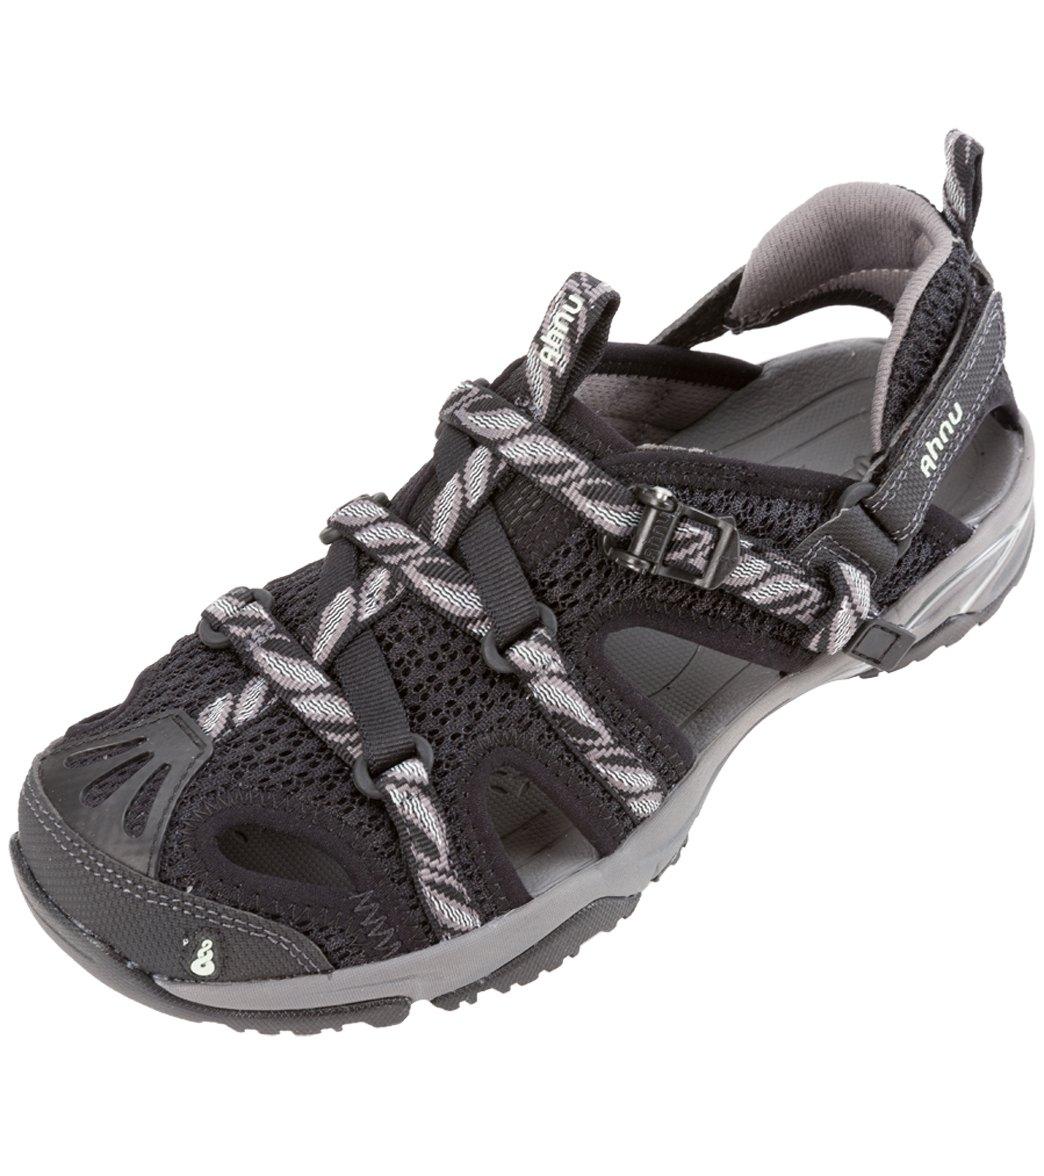 ahnu water shoes